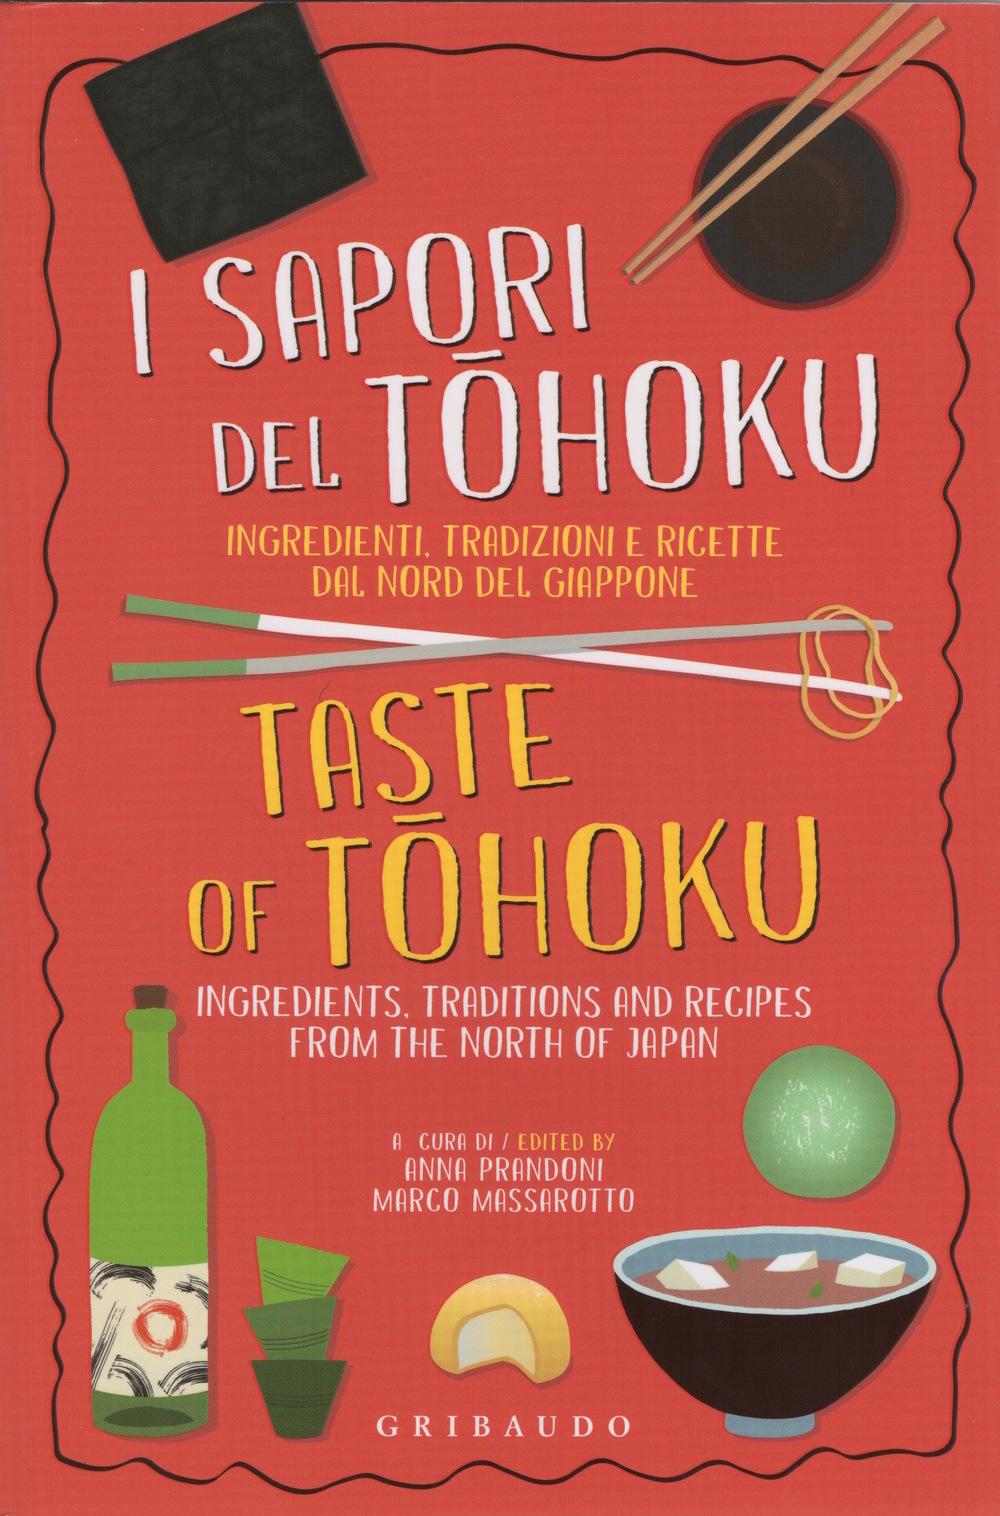 Taste of Tohoku, 2016